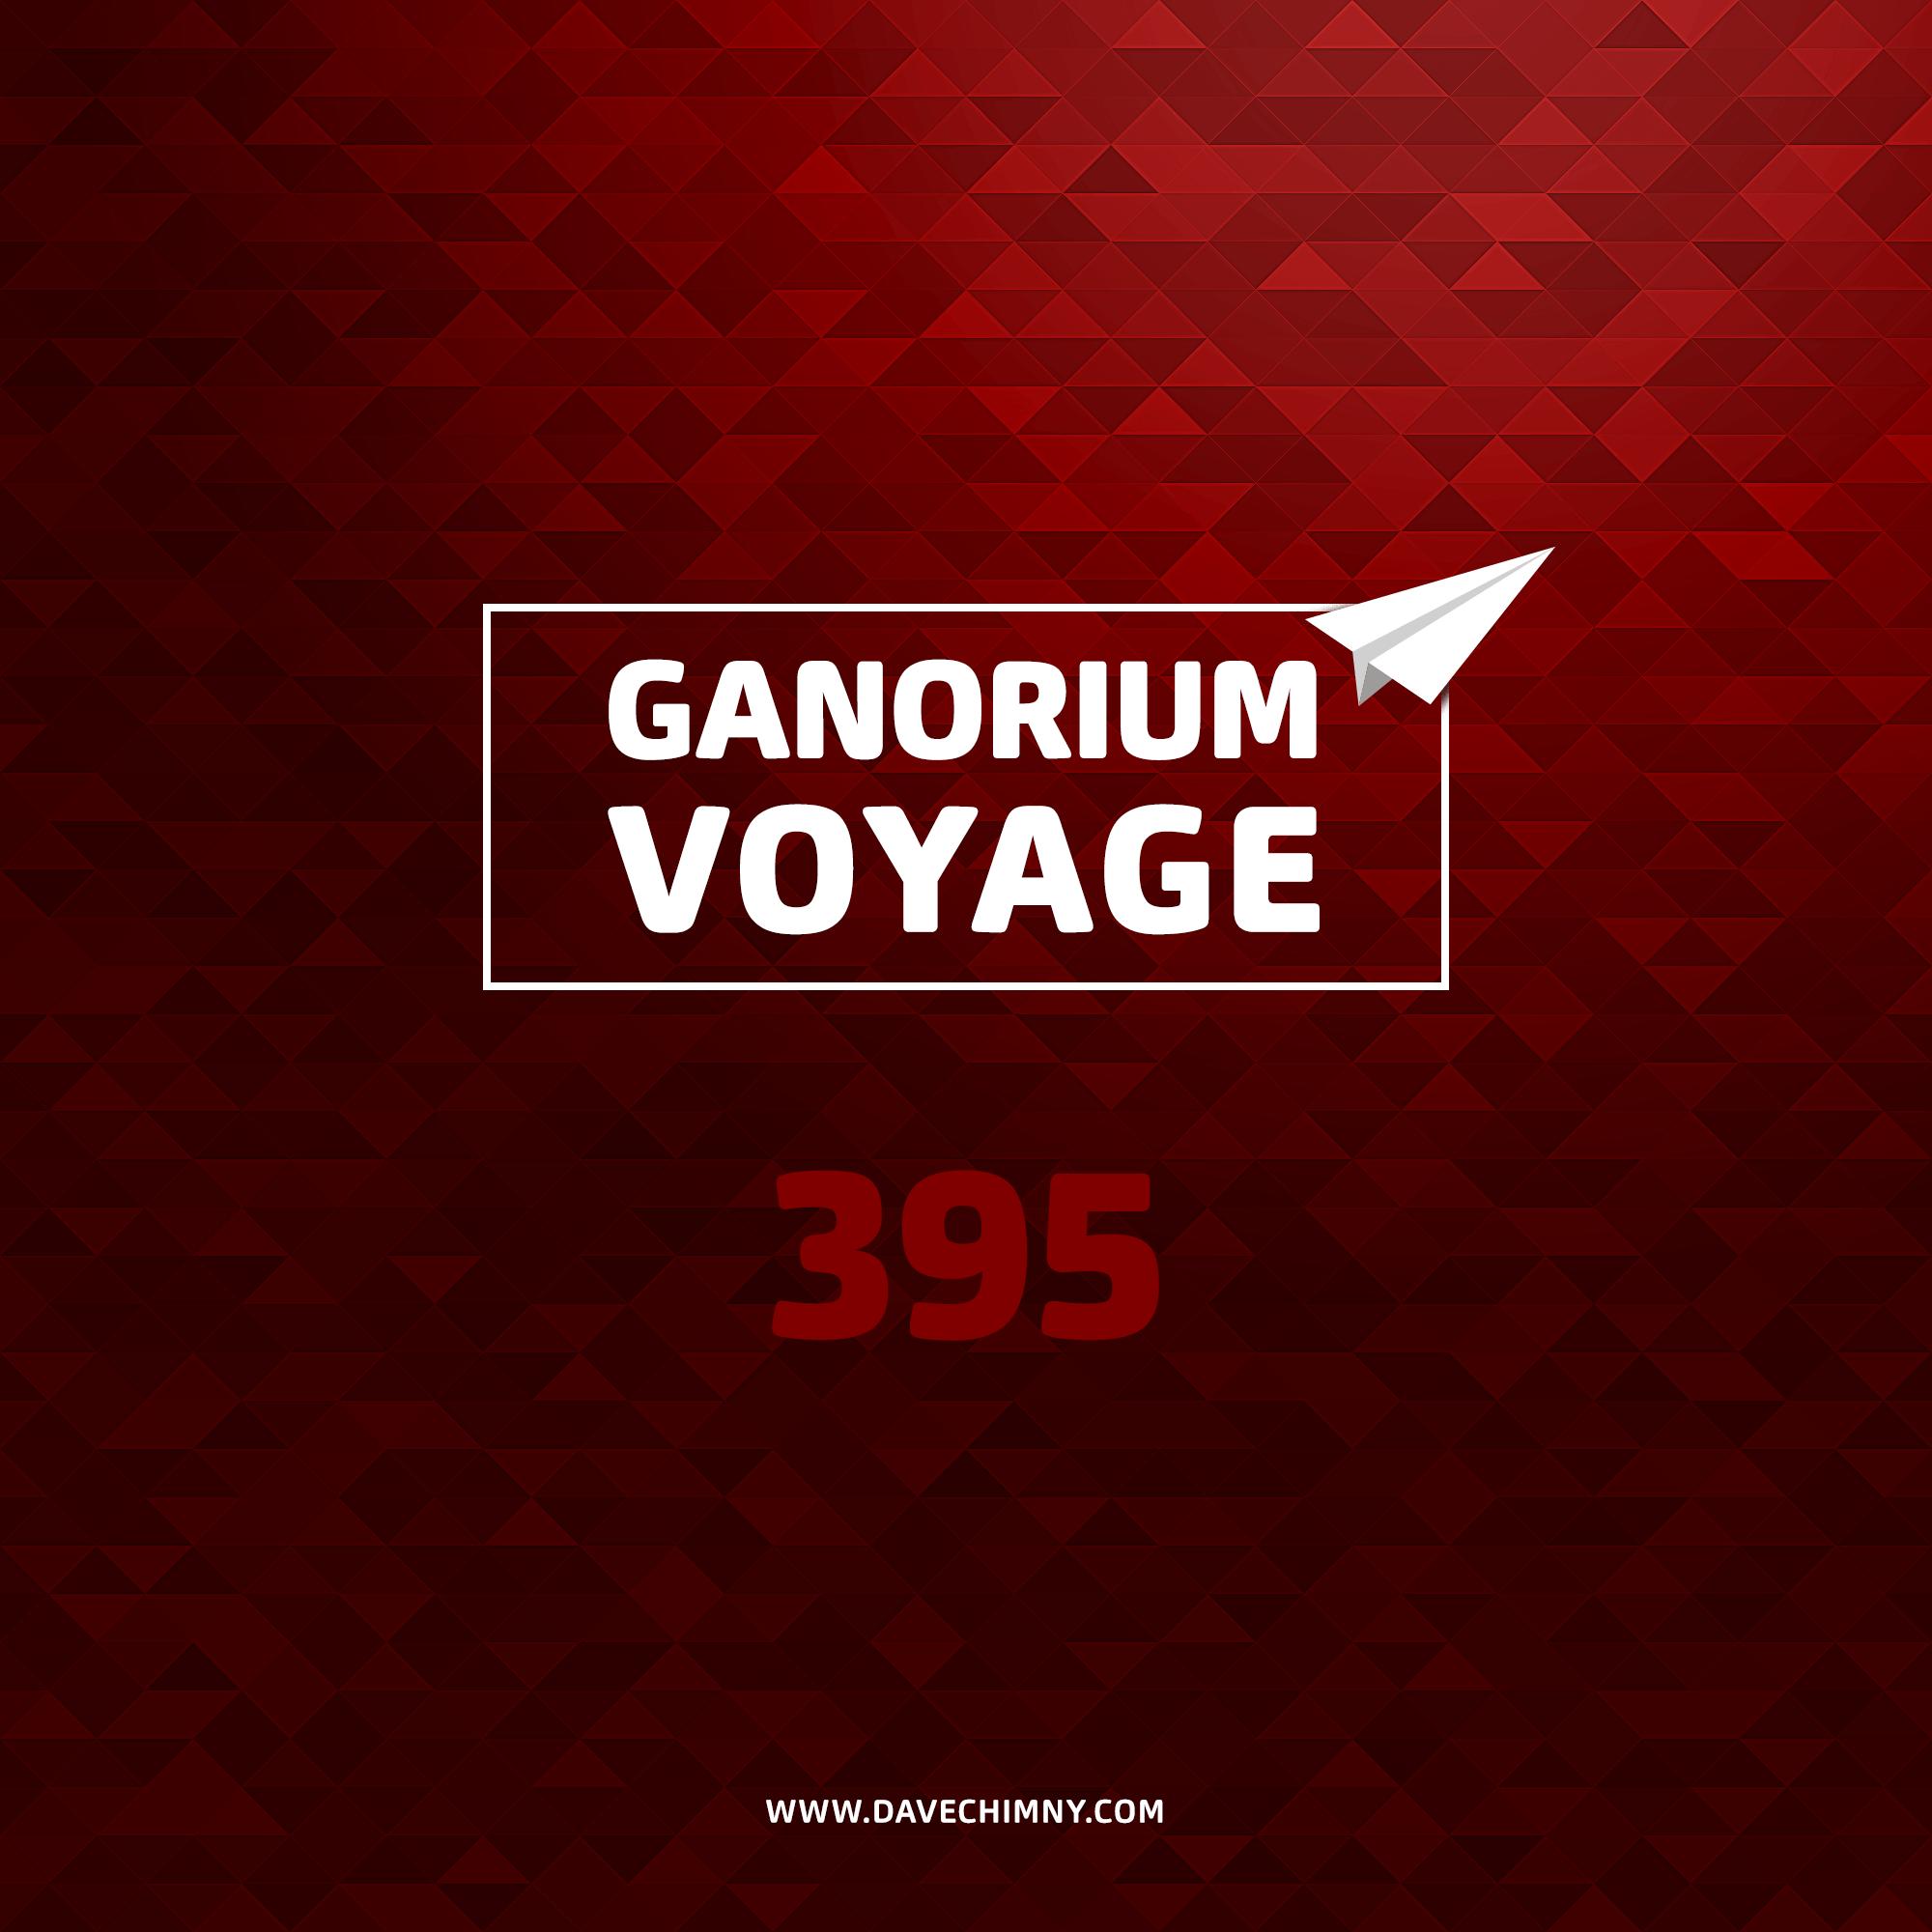 Dave Chimny - Ganorium Voyage 395